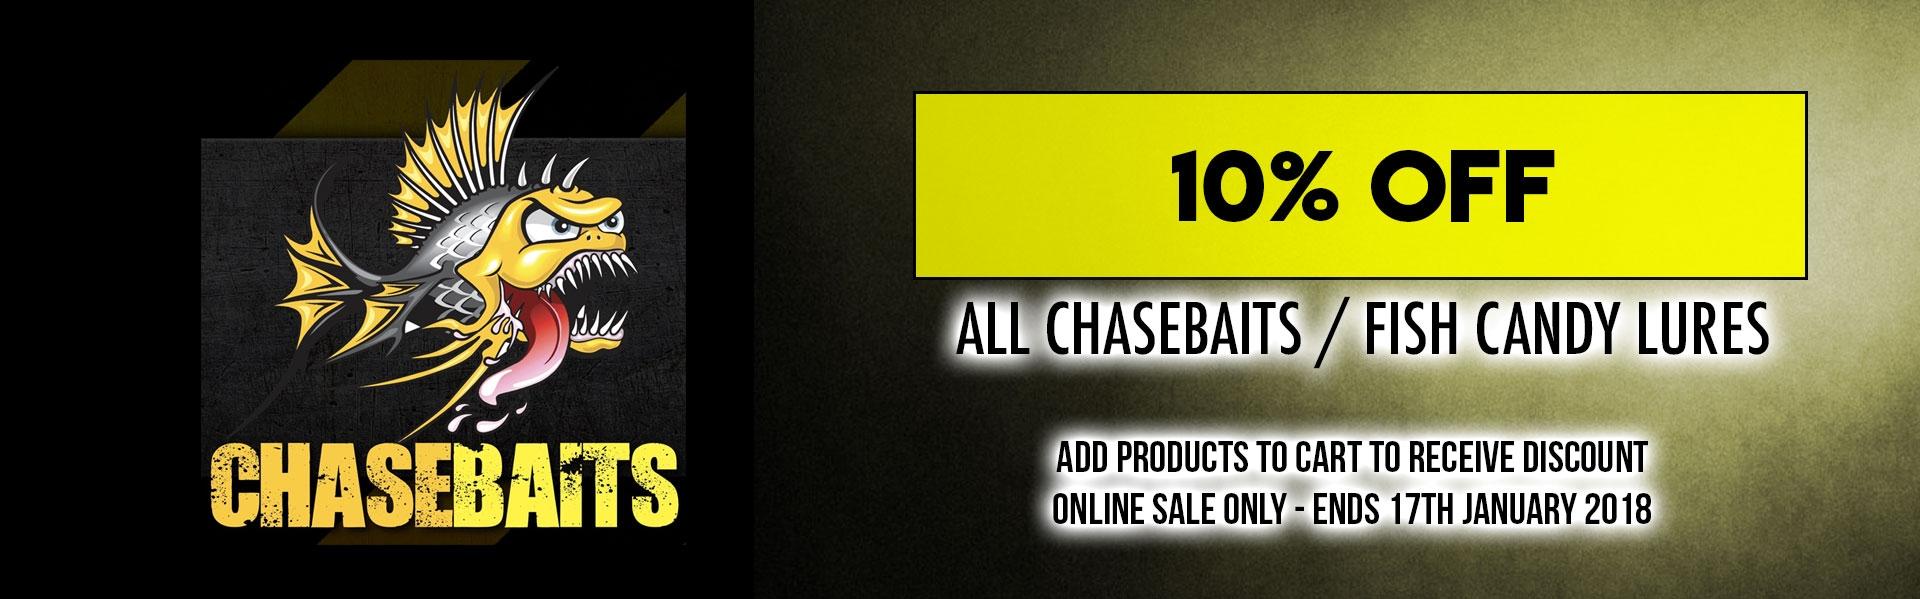 10% off Chasebaits